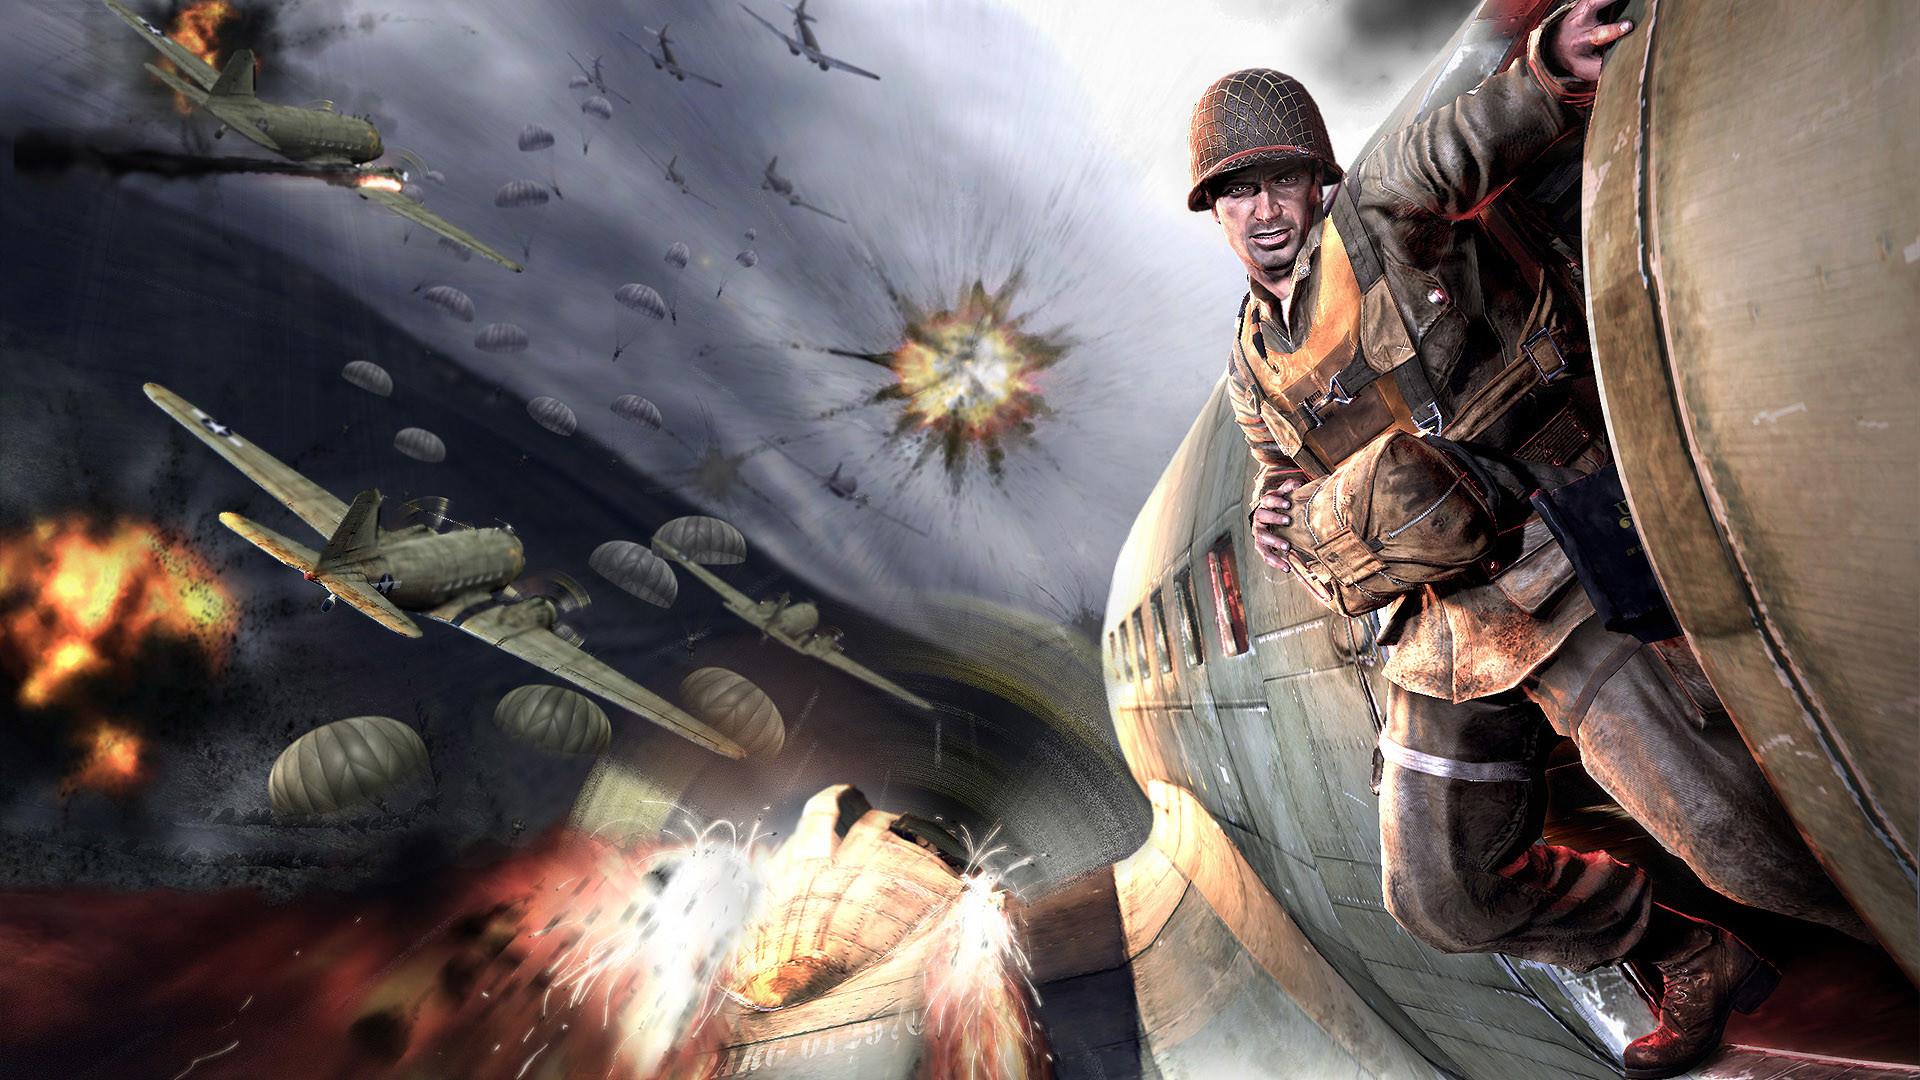 .com/world-war-2-fighter-planes-